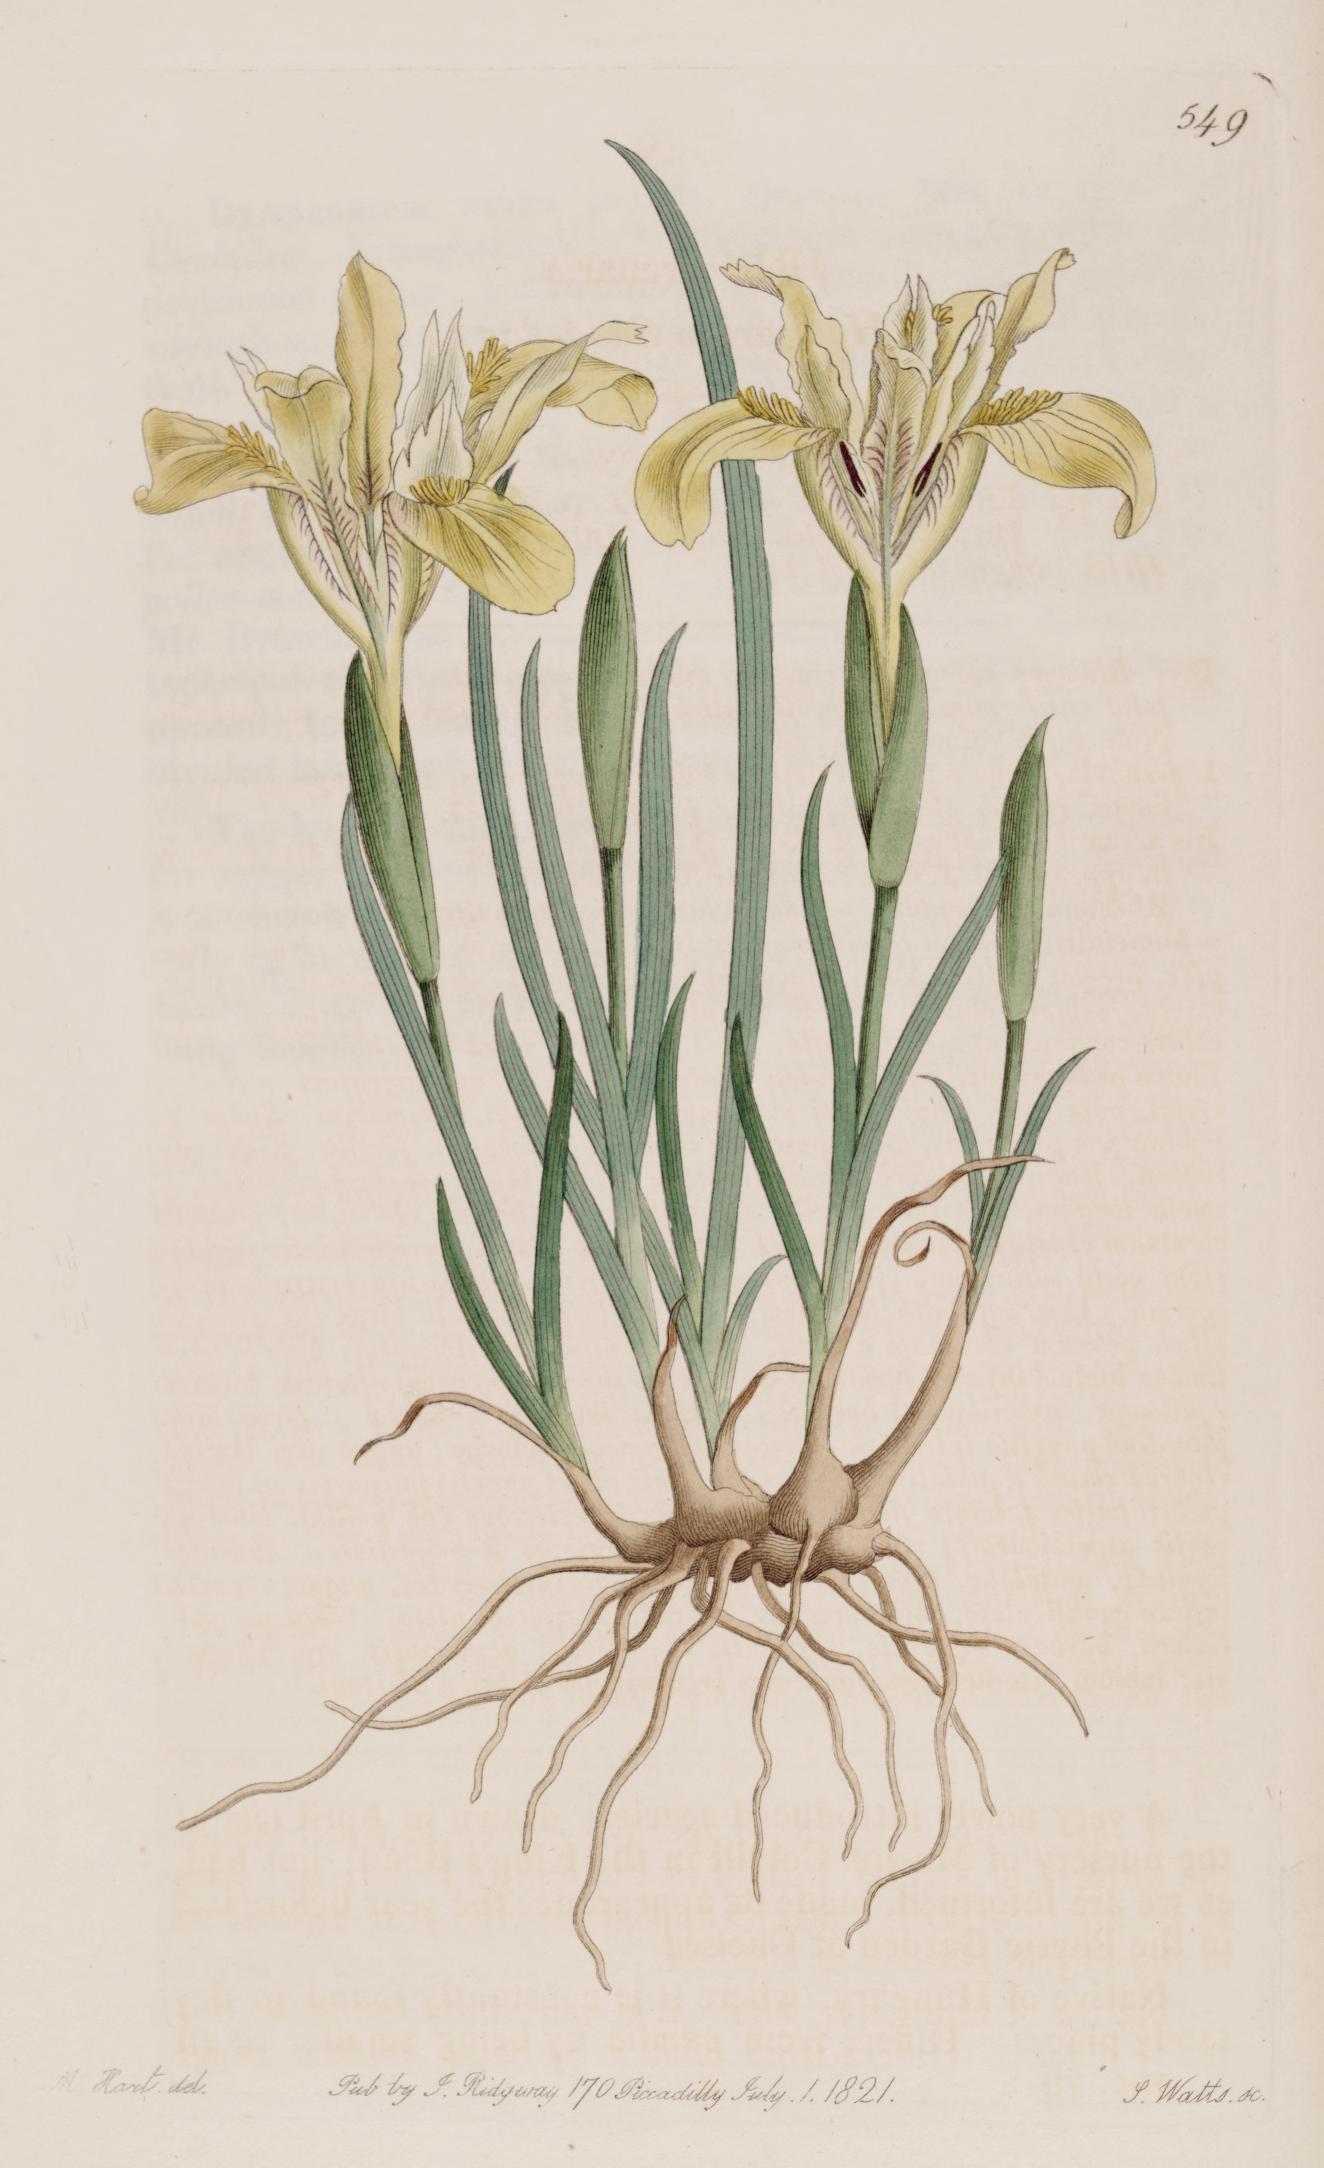 Physic garden wikipedia - Courtesy Of The Biodiversity Heritage Library